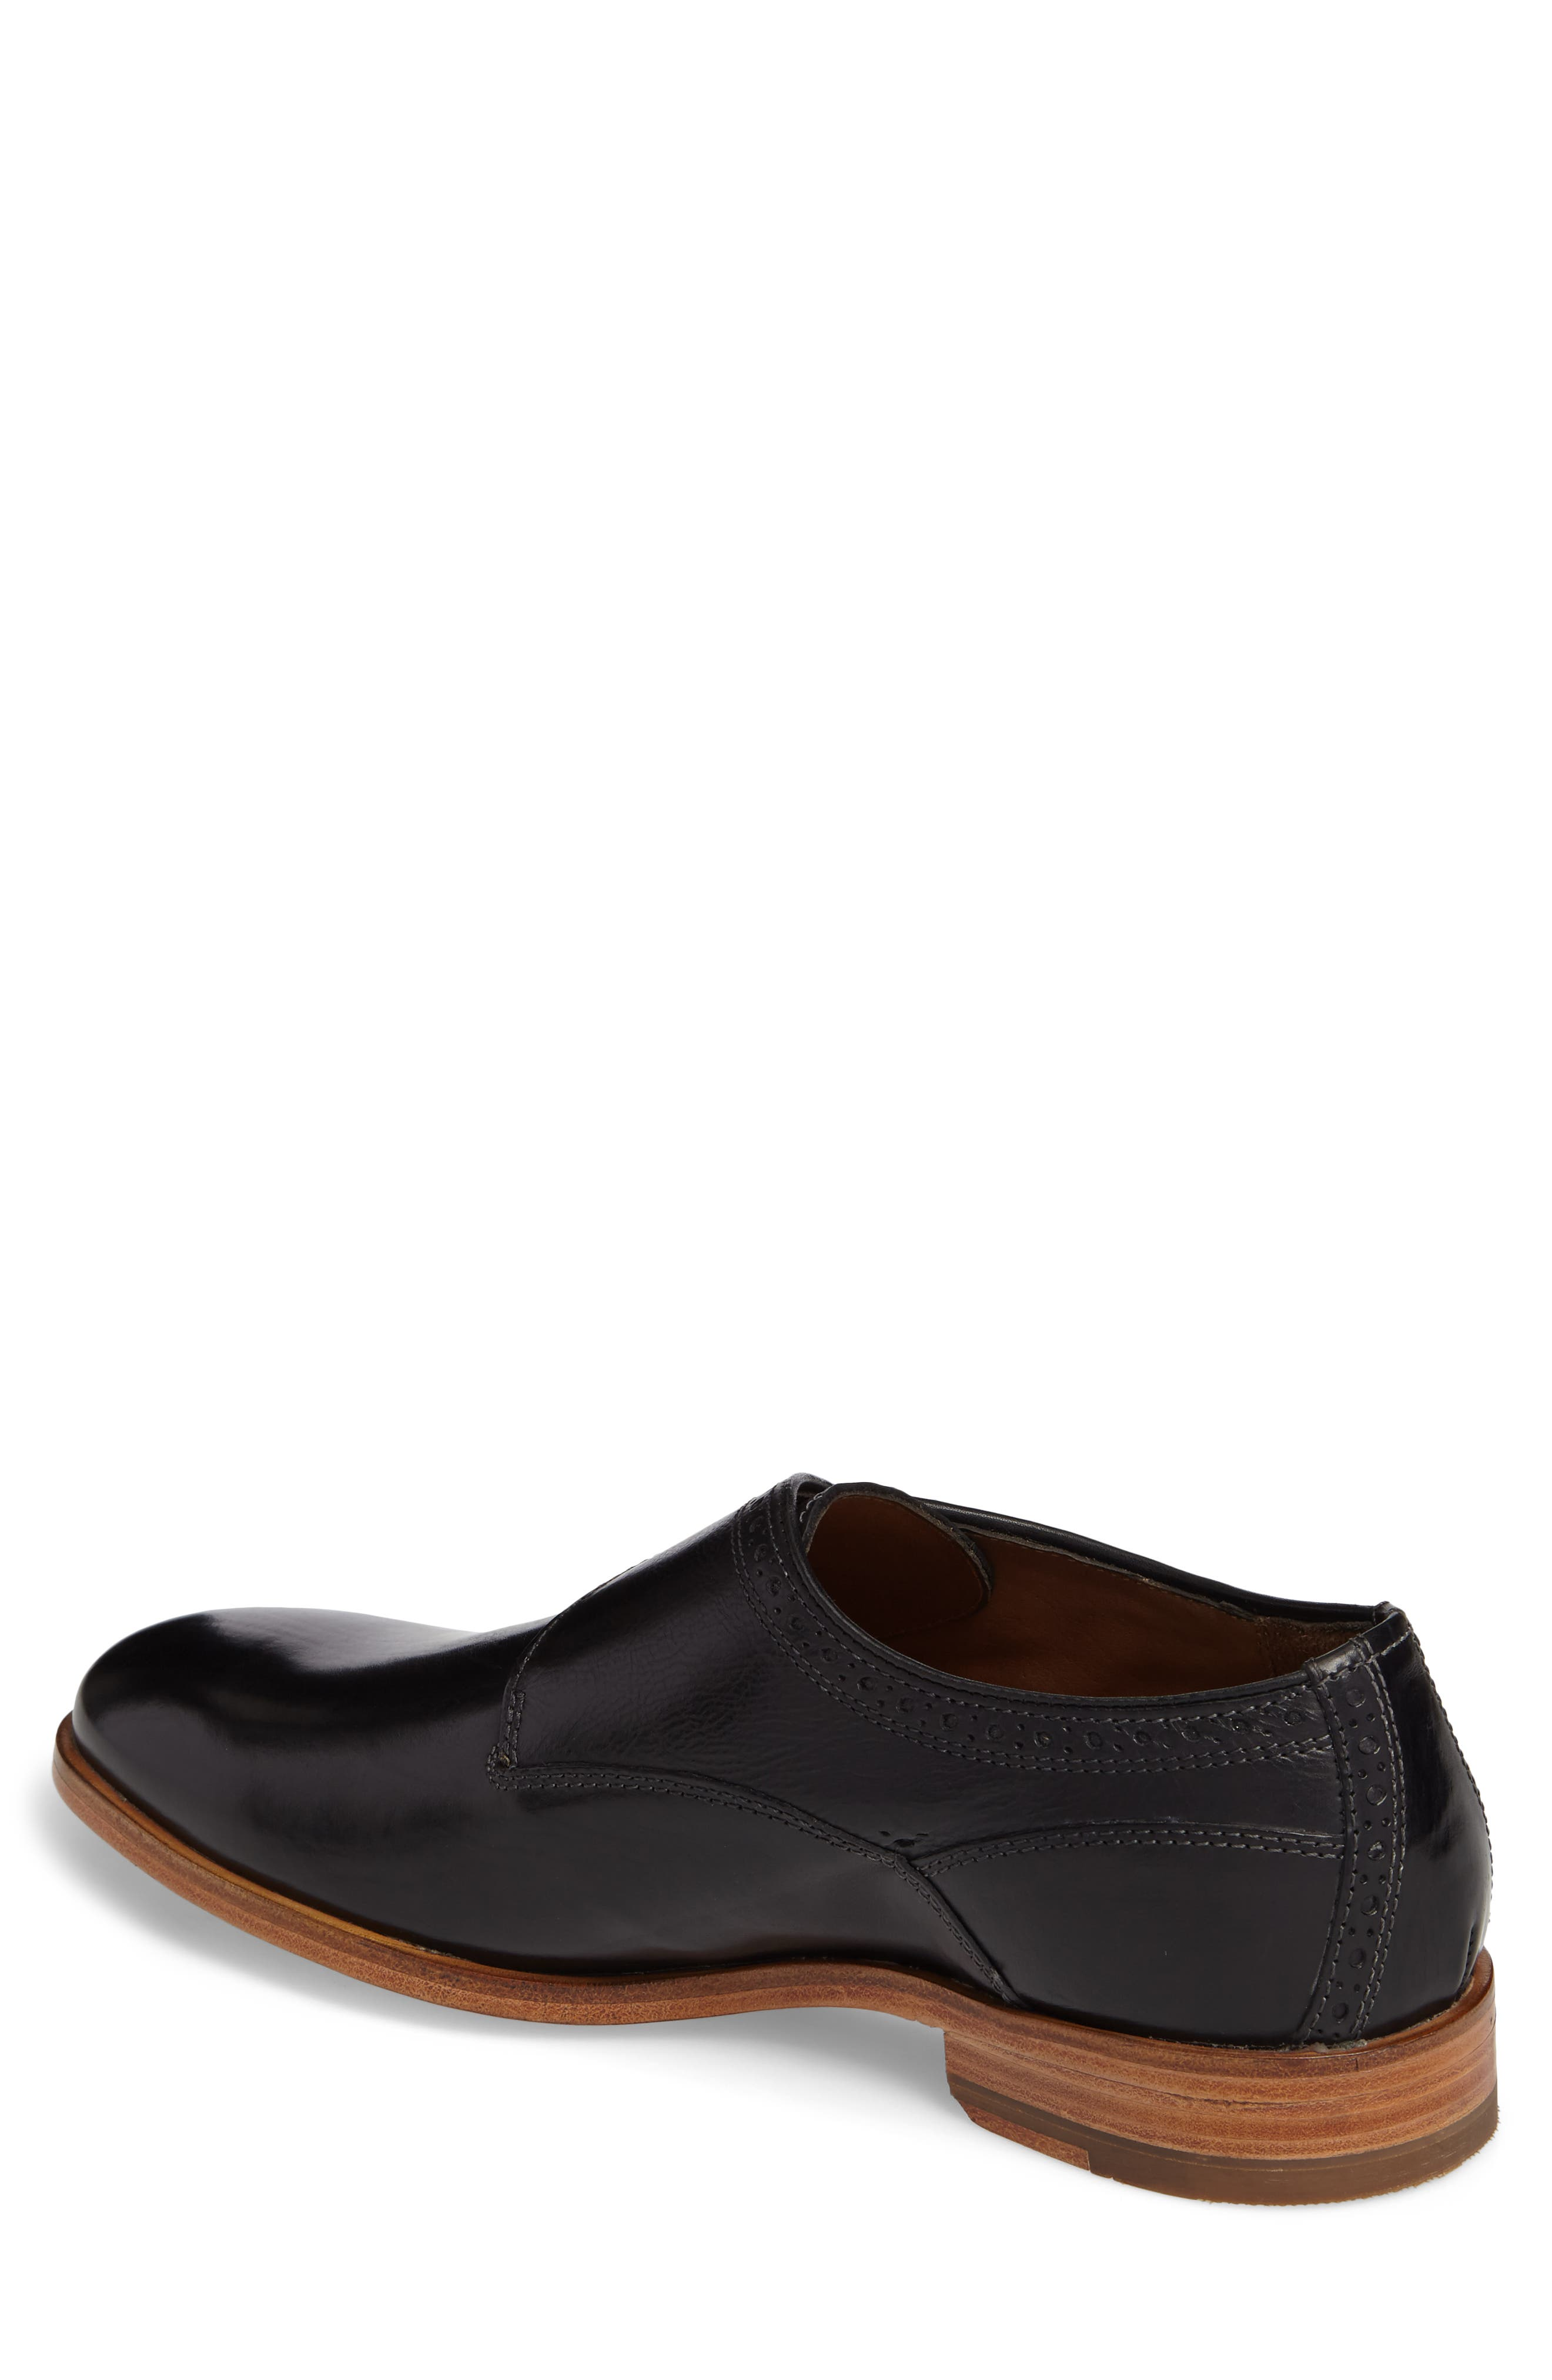 Alternate Image 2  - J&M 1850 Graham Monk Strap Shoe (Men)